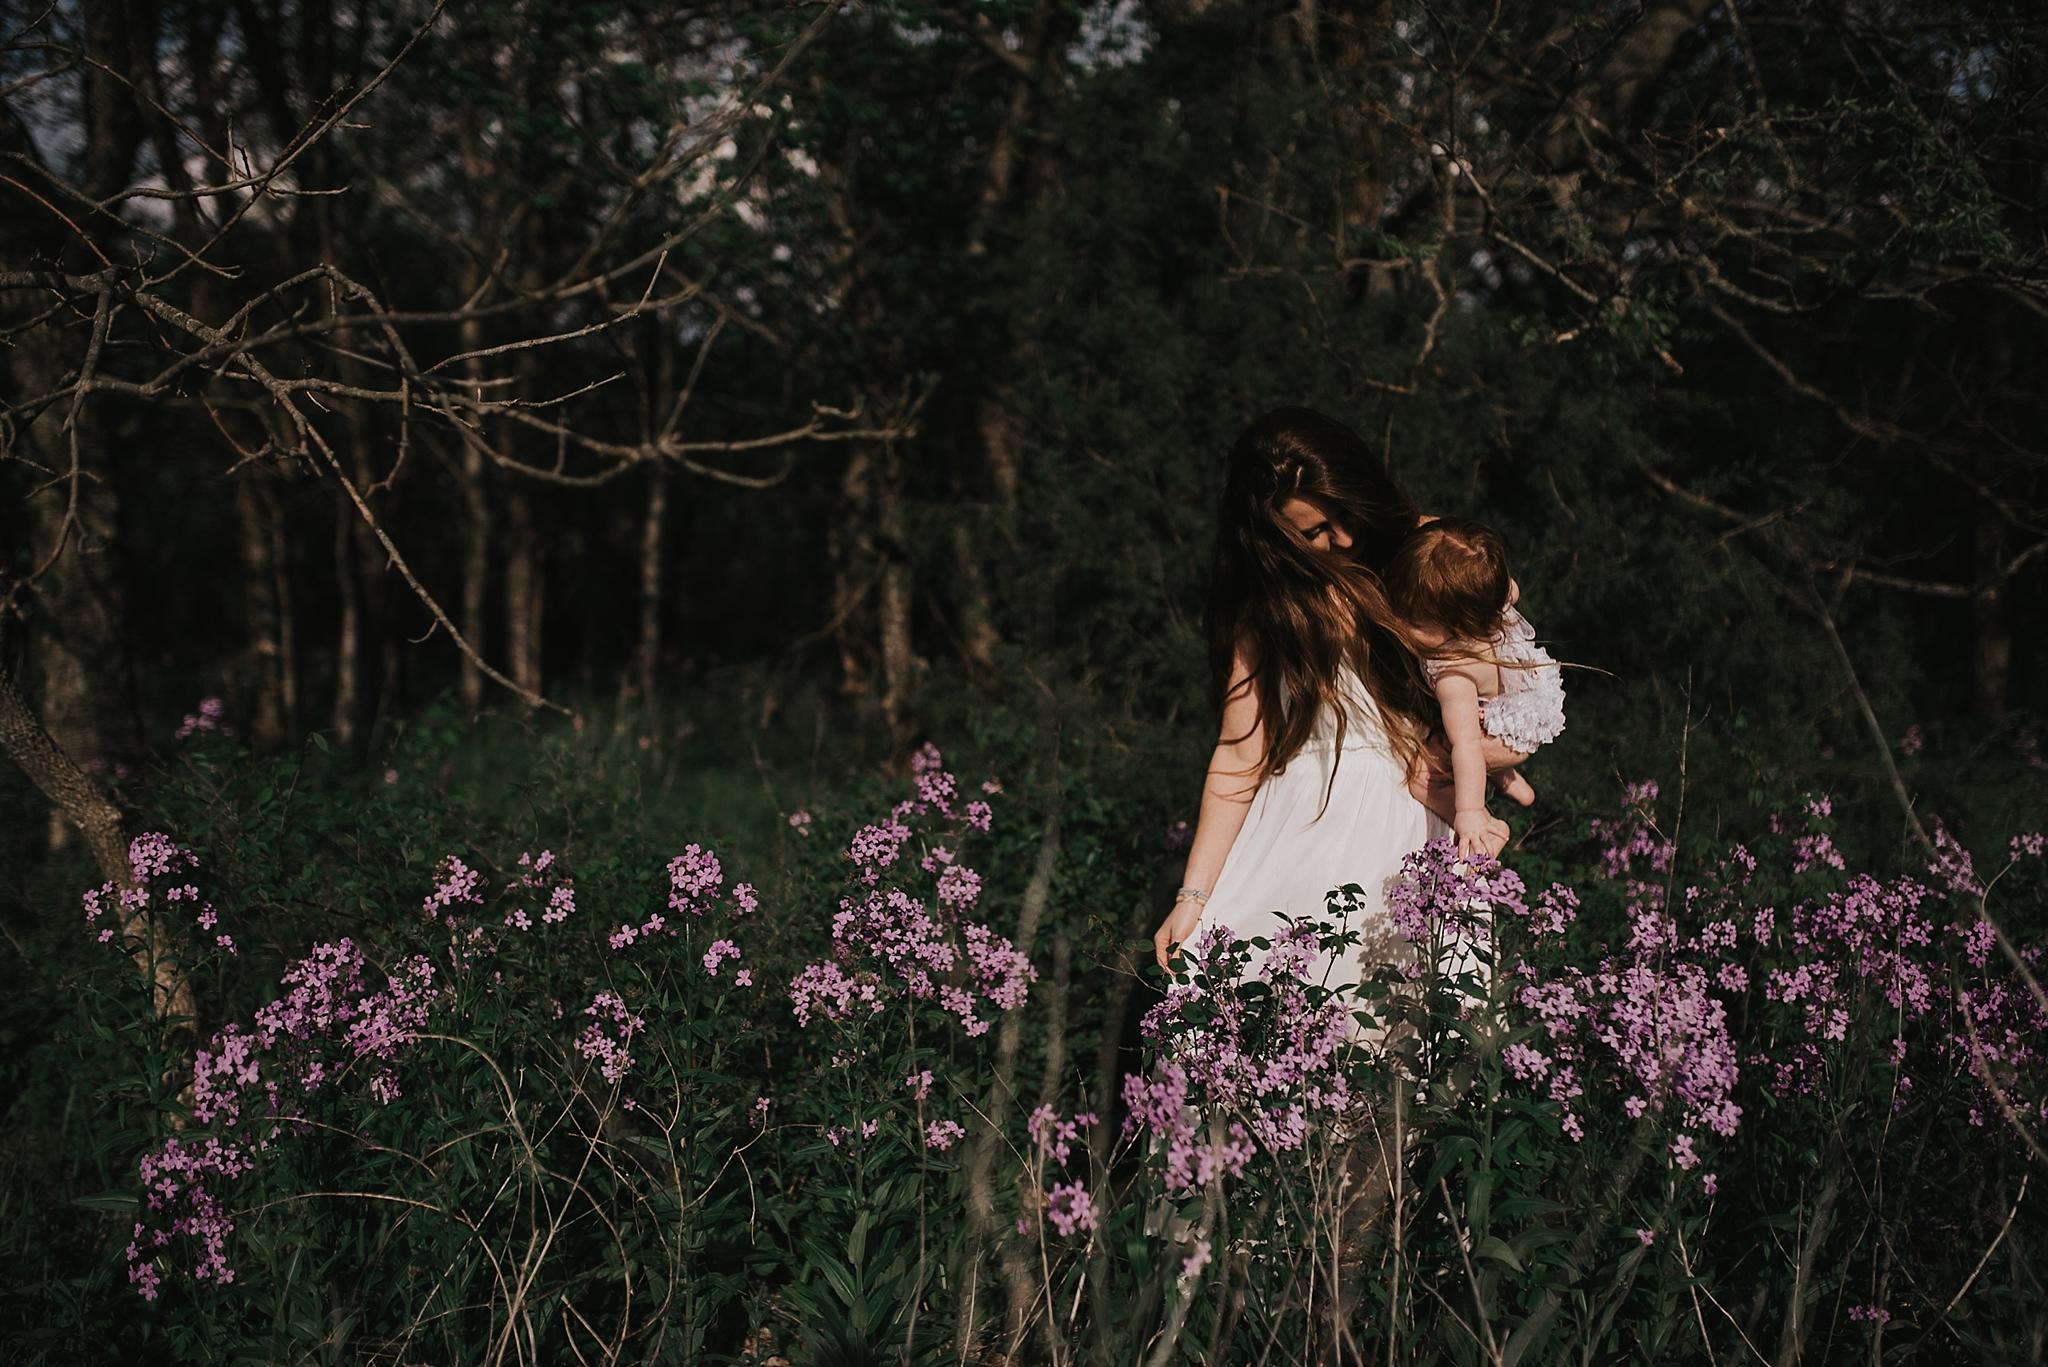 twyla jones photography - mother daughter - field and forest-4245_treasure coast florida.jpg